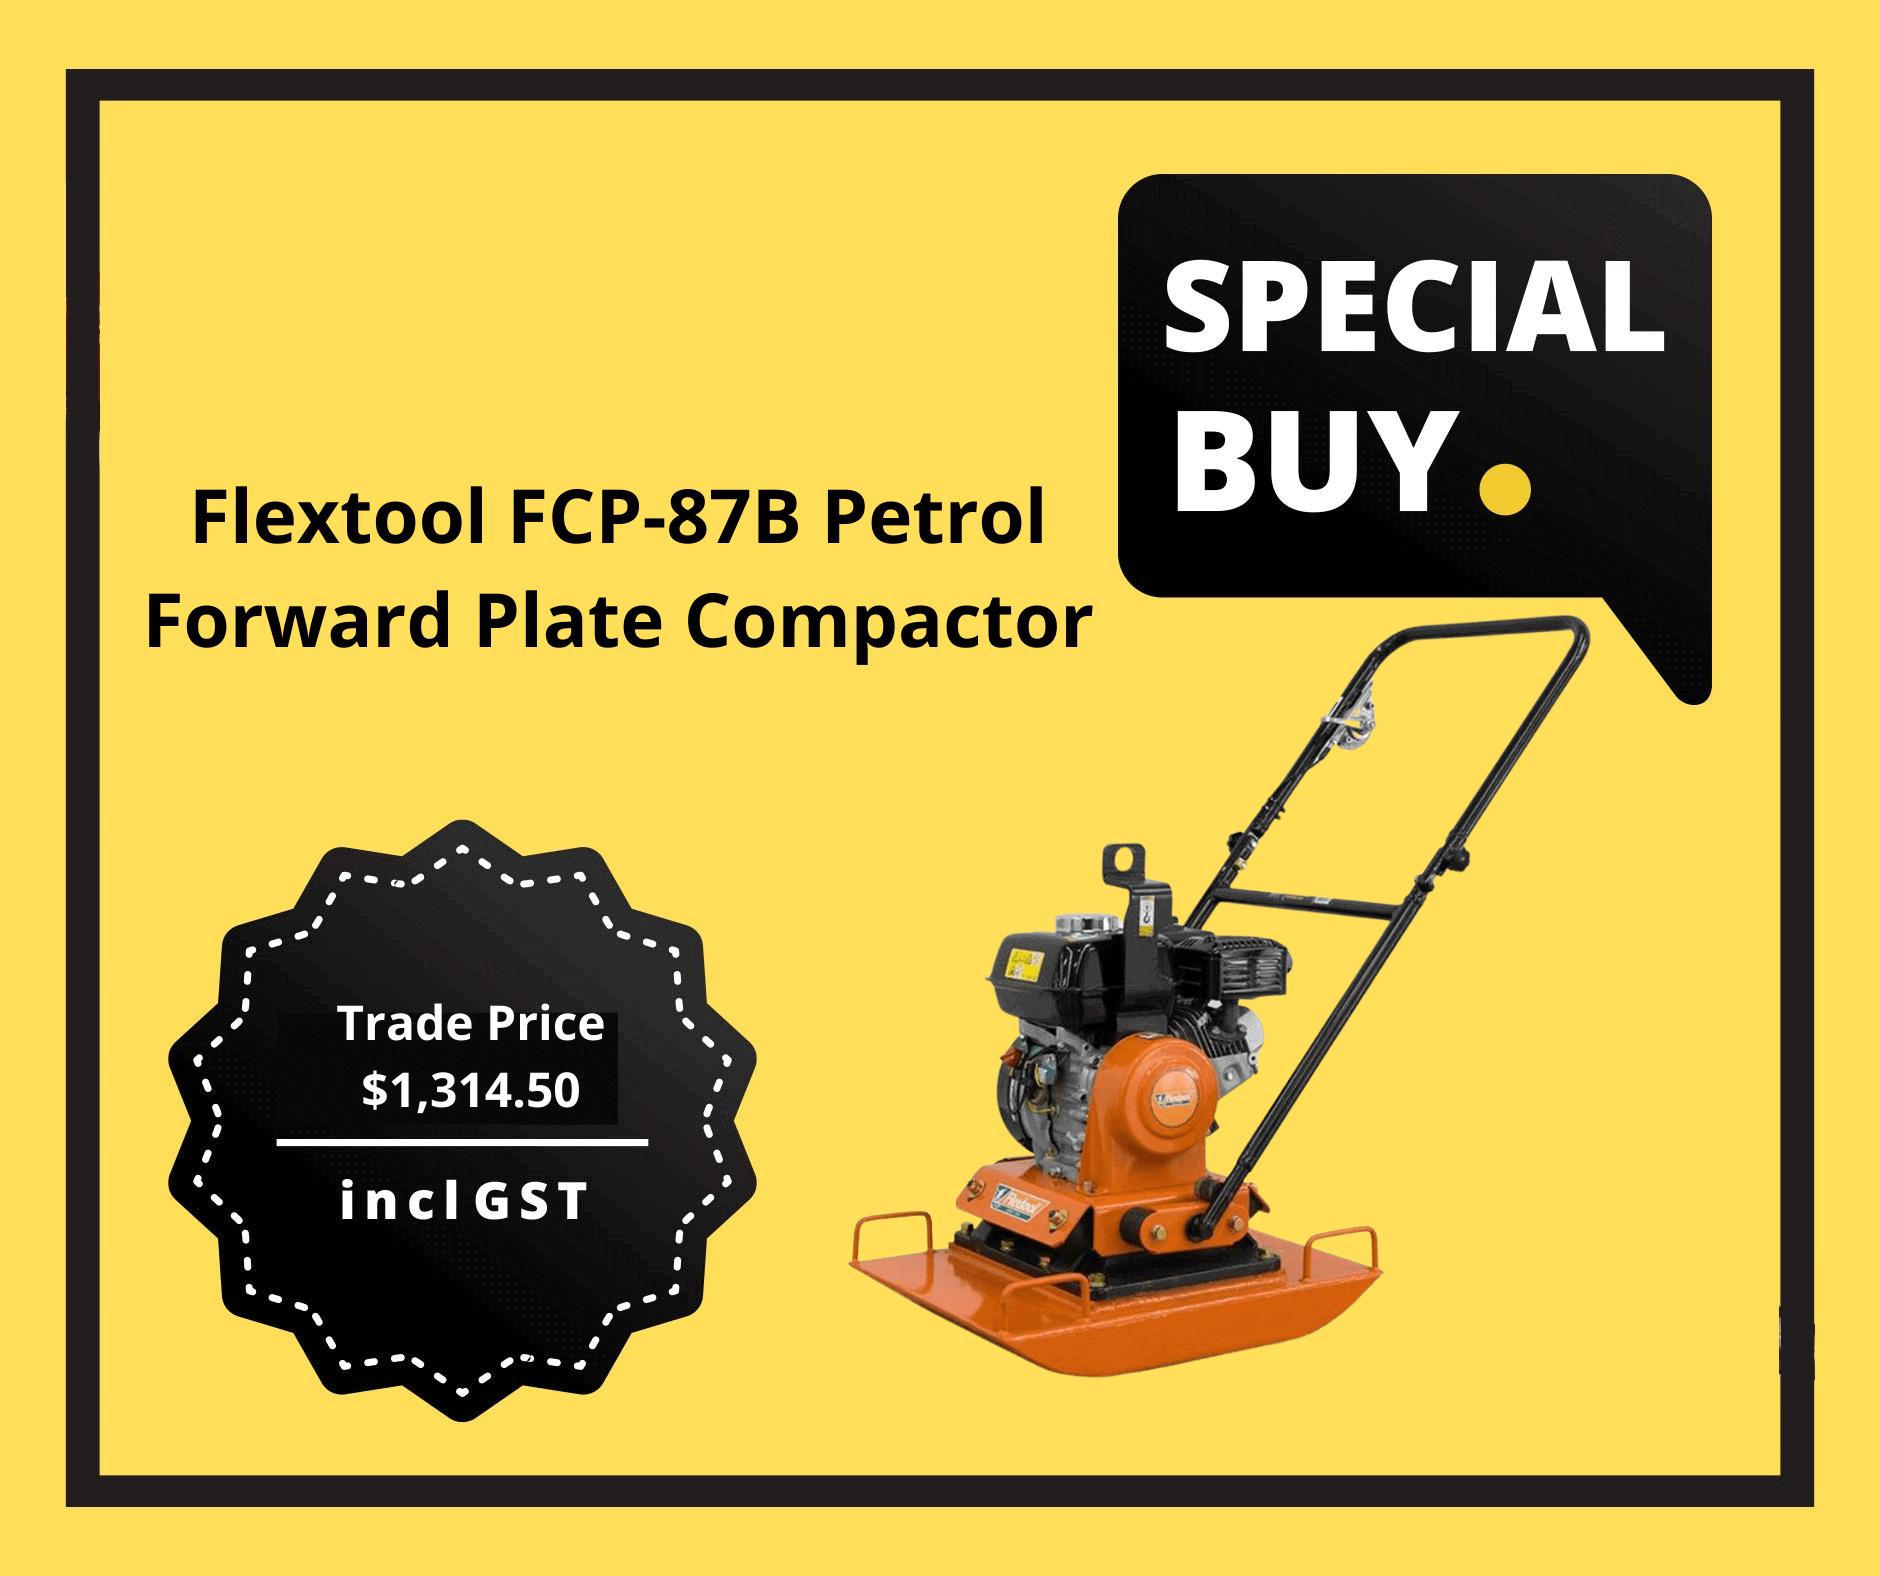 Flextool FCP-87B Petrol Forward Plate Compactor